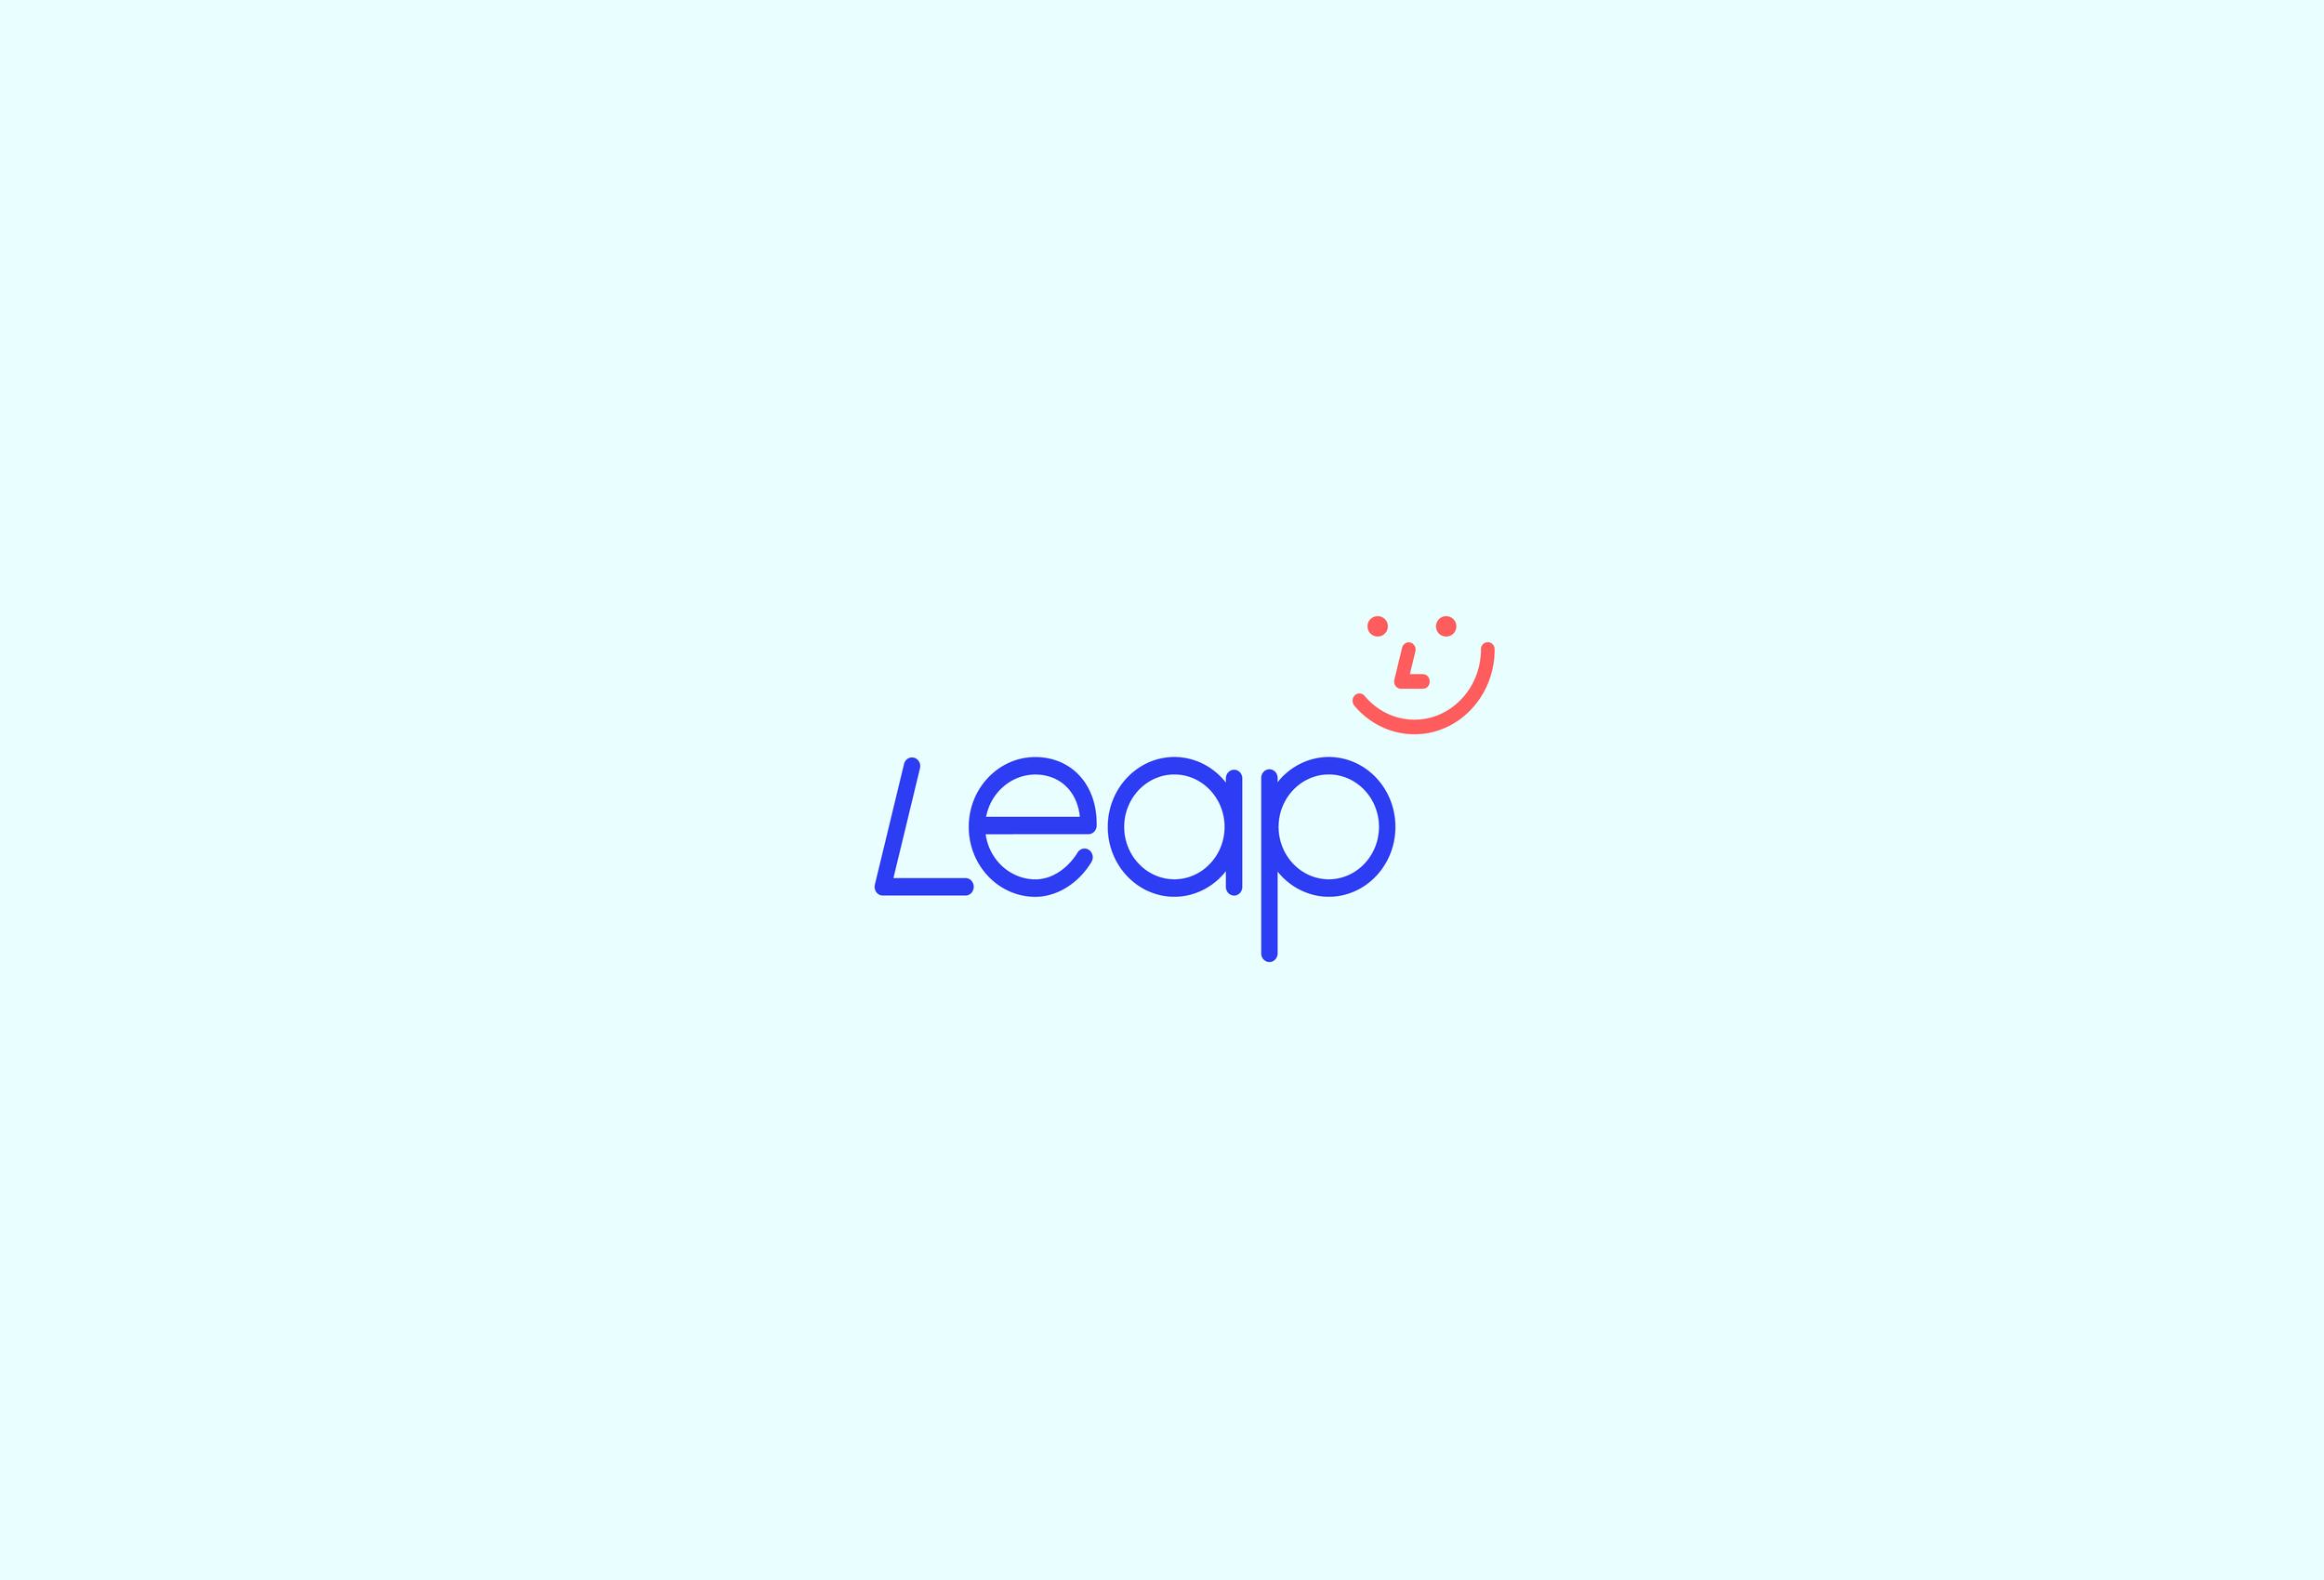 leap-01.png